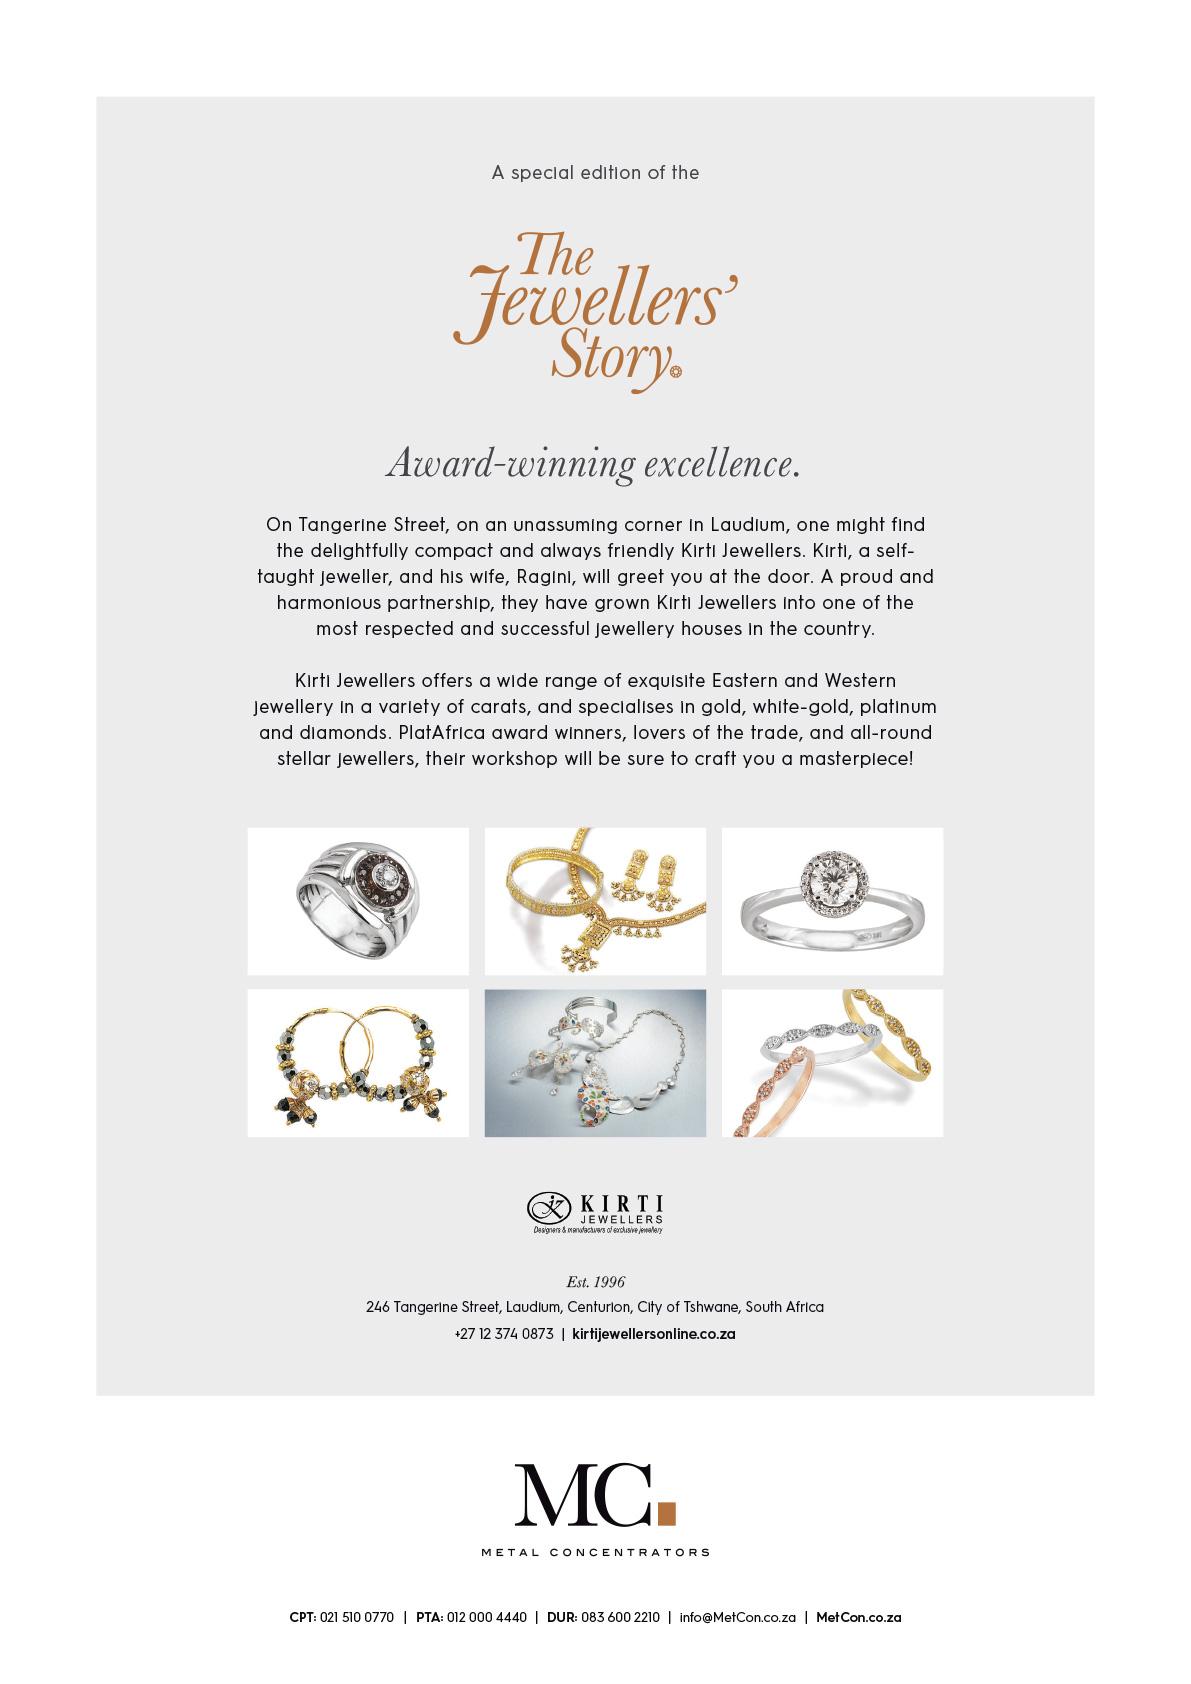 Kirti Jewellers